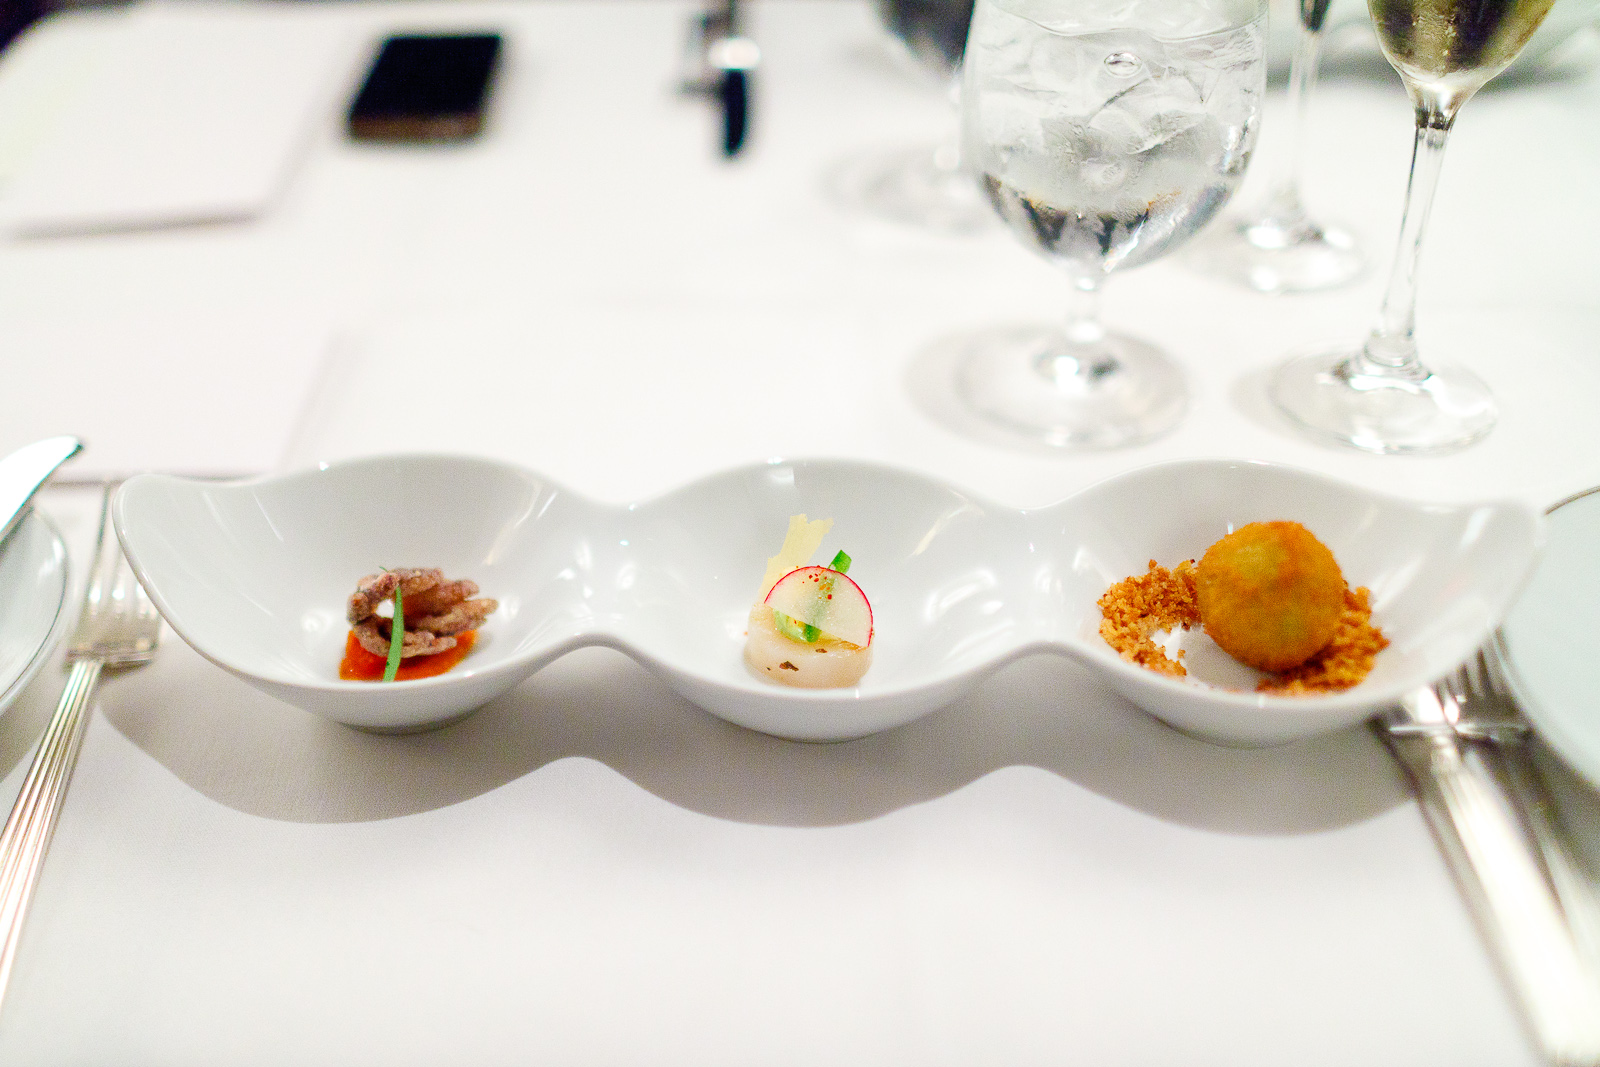 Canapes: Squid in fra diavolo, ceviche, arancini